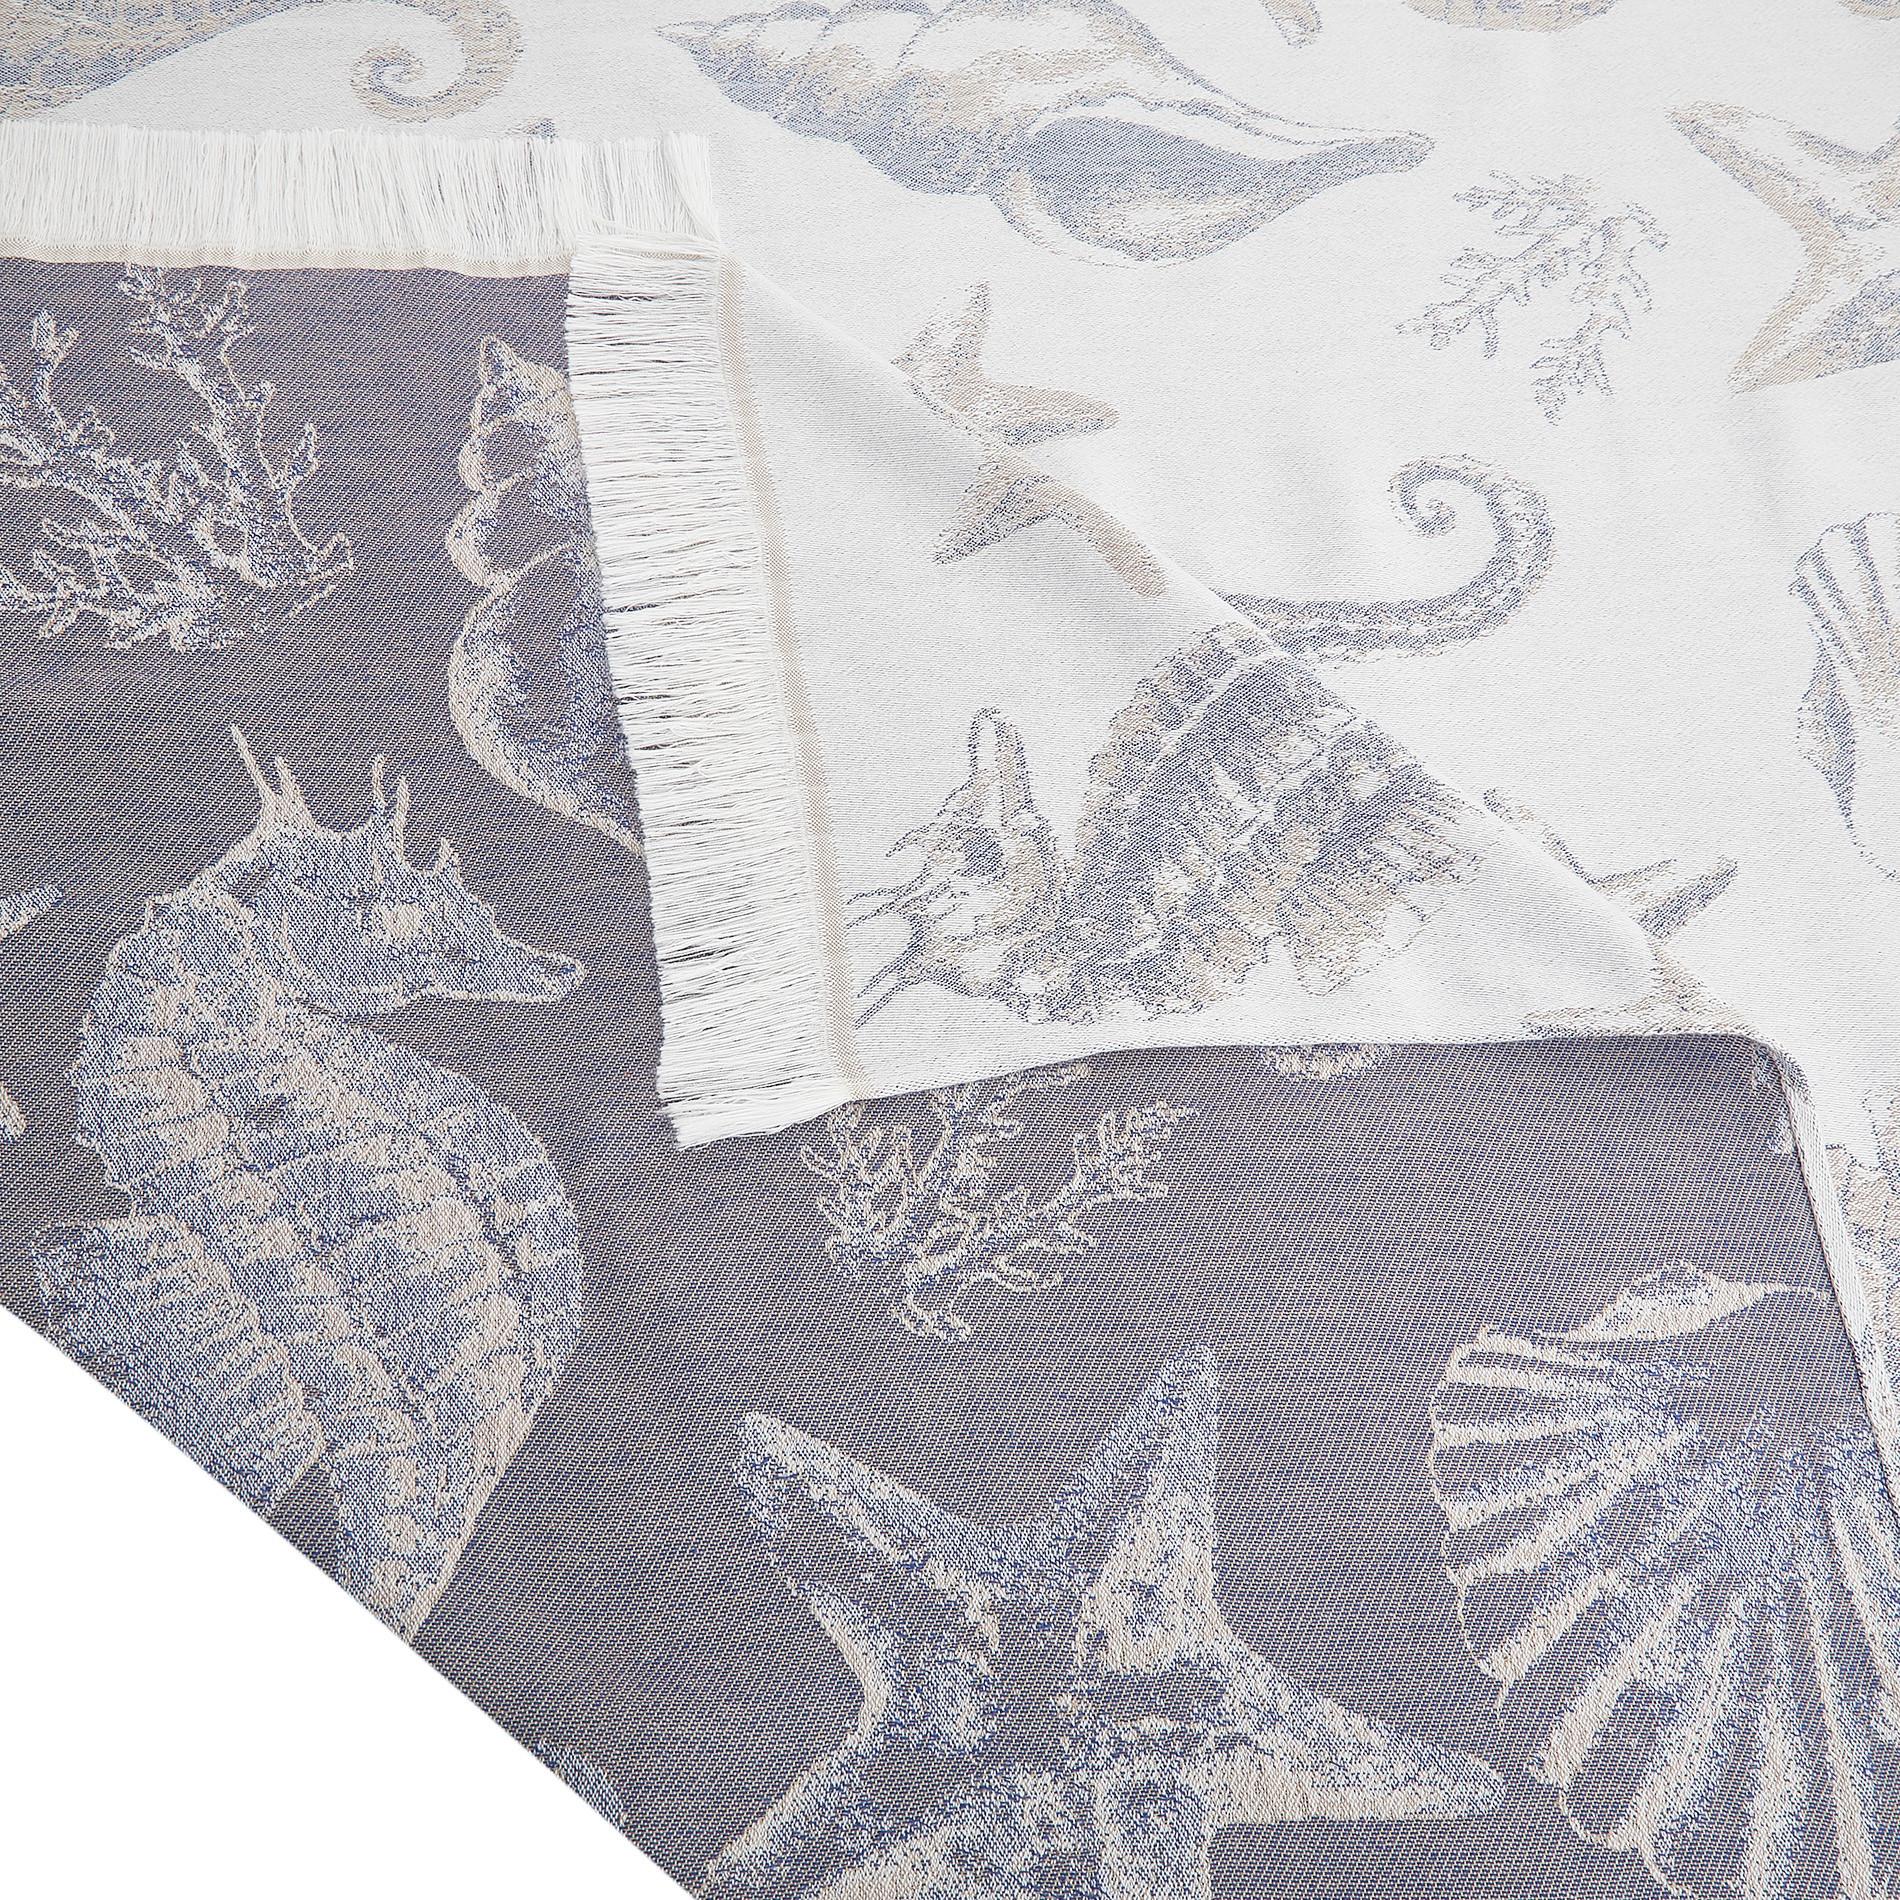 Telo mare cotone leggero motivo conchiglie, Bianco, large image number 1